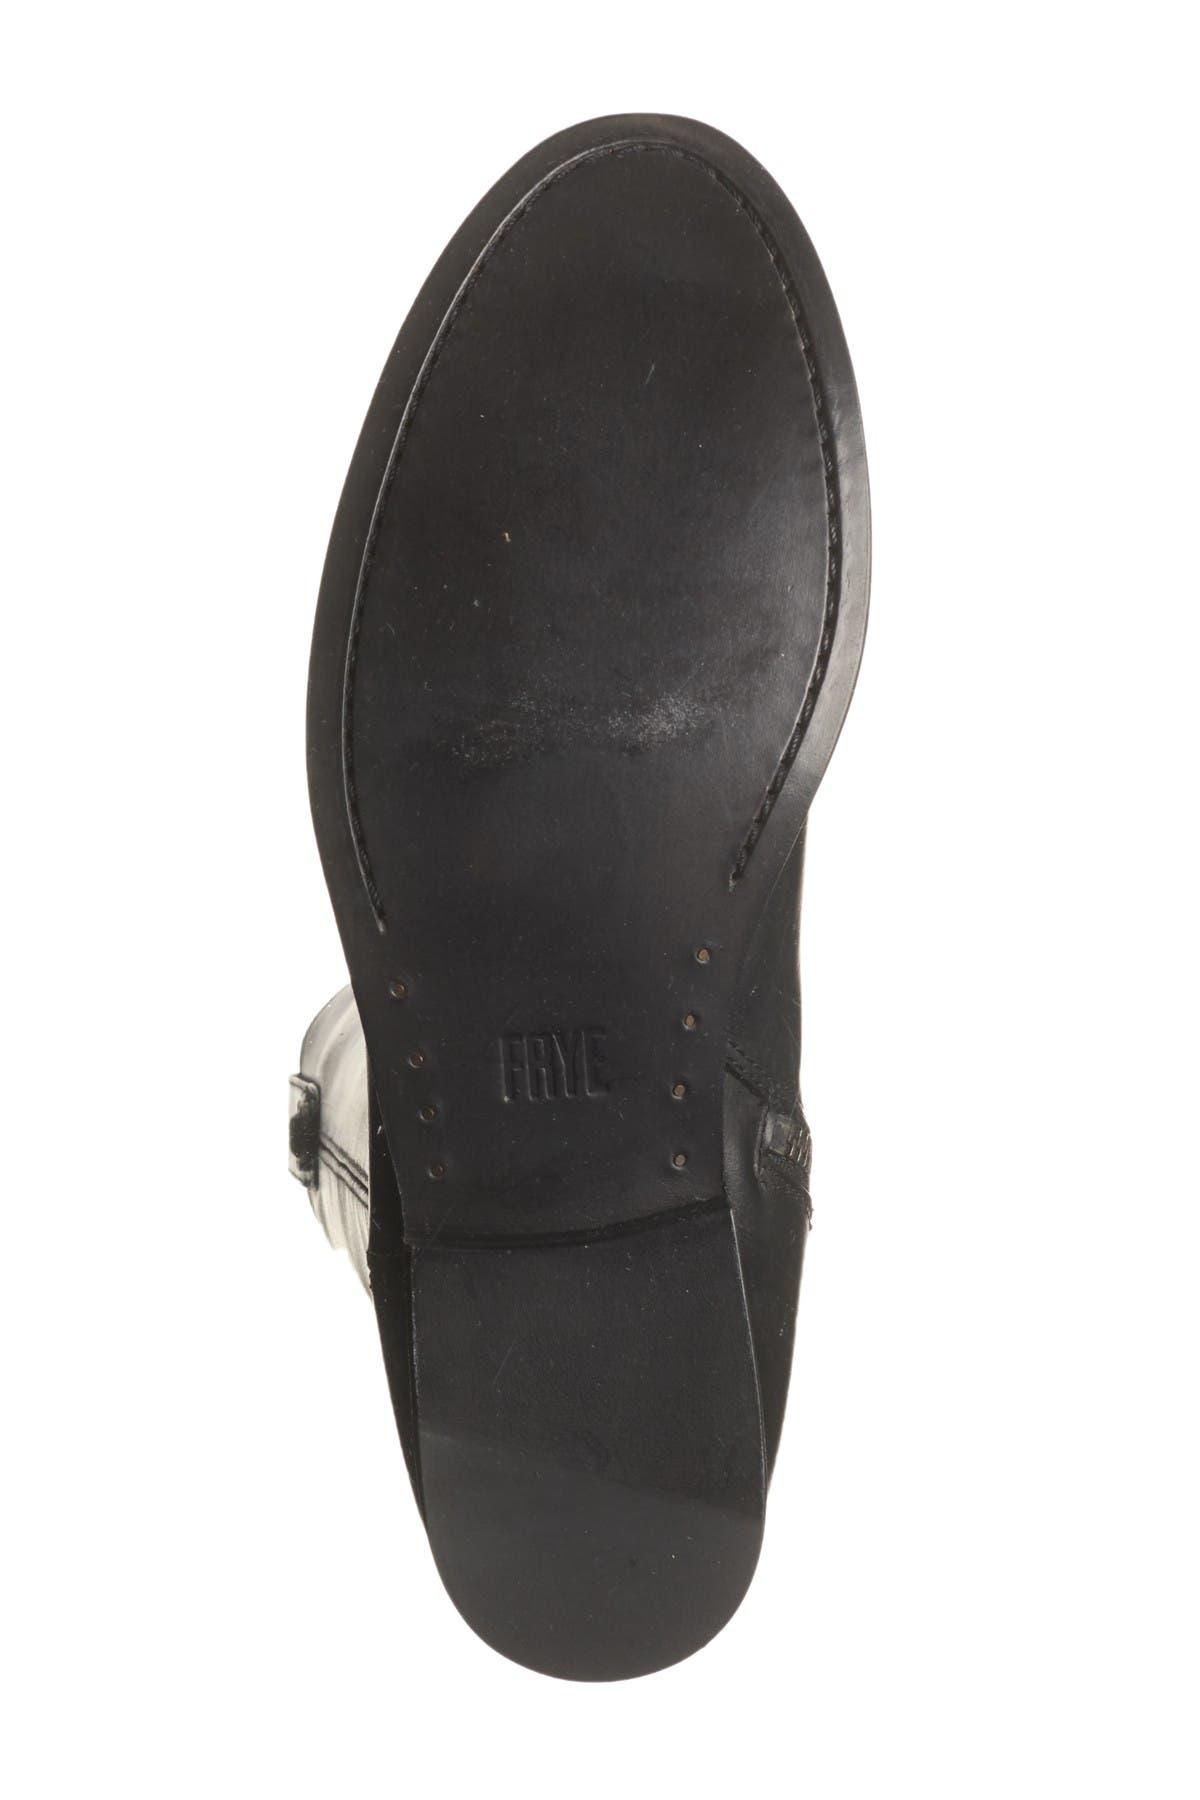 Frye Melissa Button Inside Zip Leather Boot